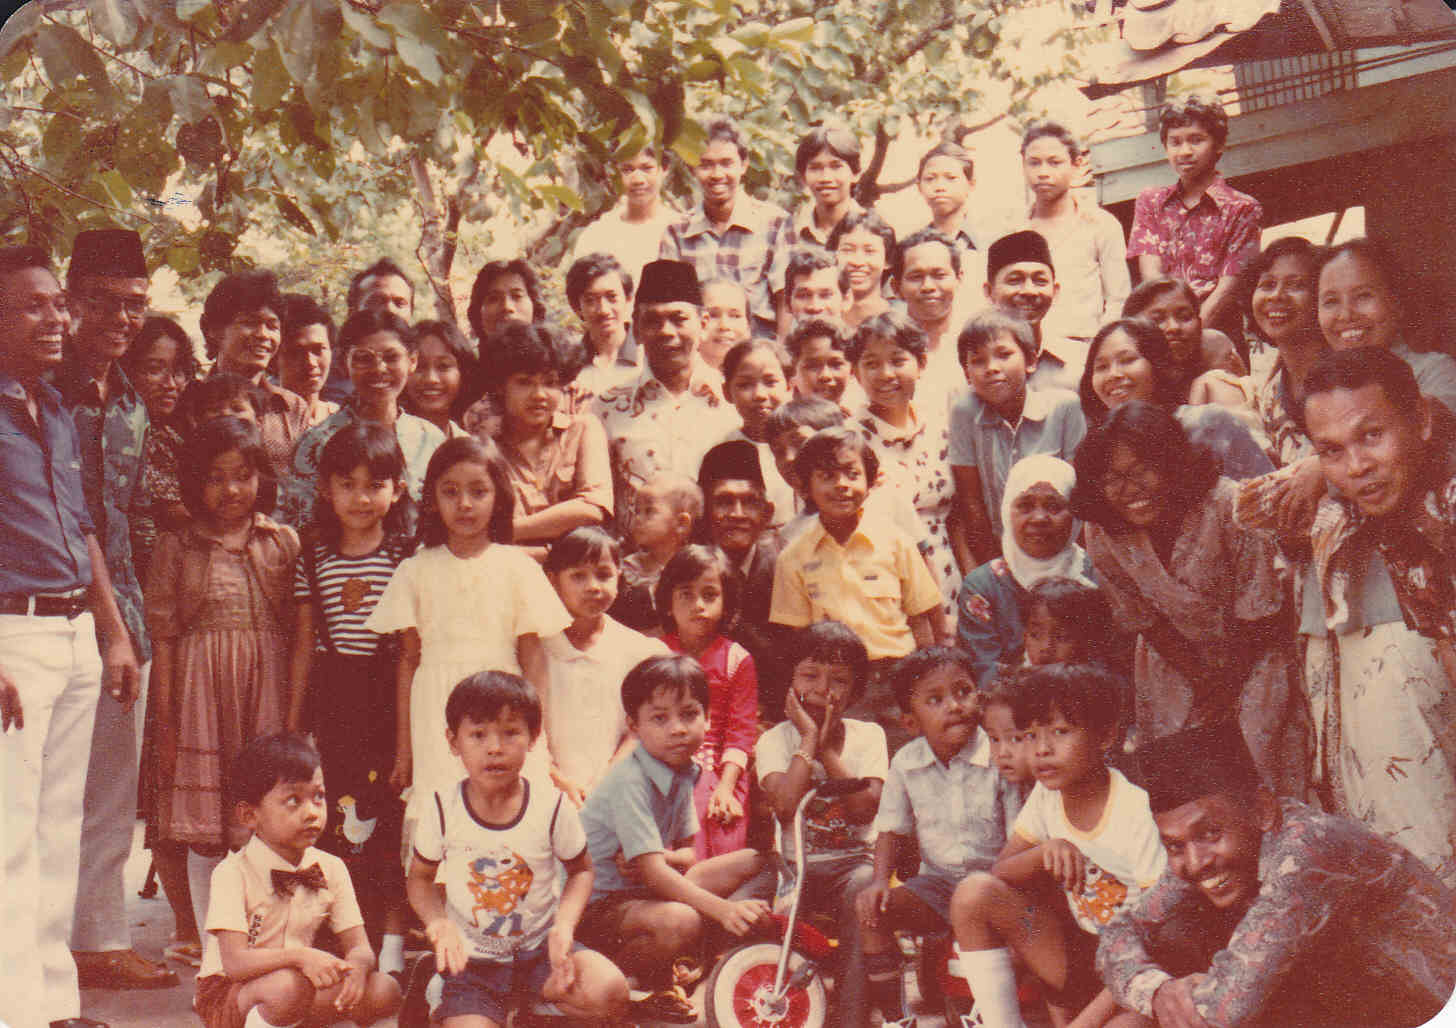 Situs Keluarga Besar H Idris Kata Kata Bijak